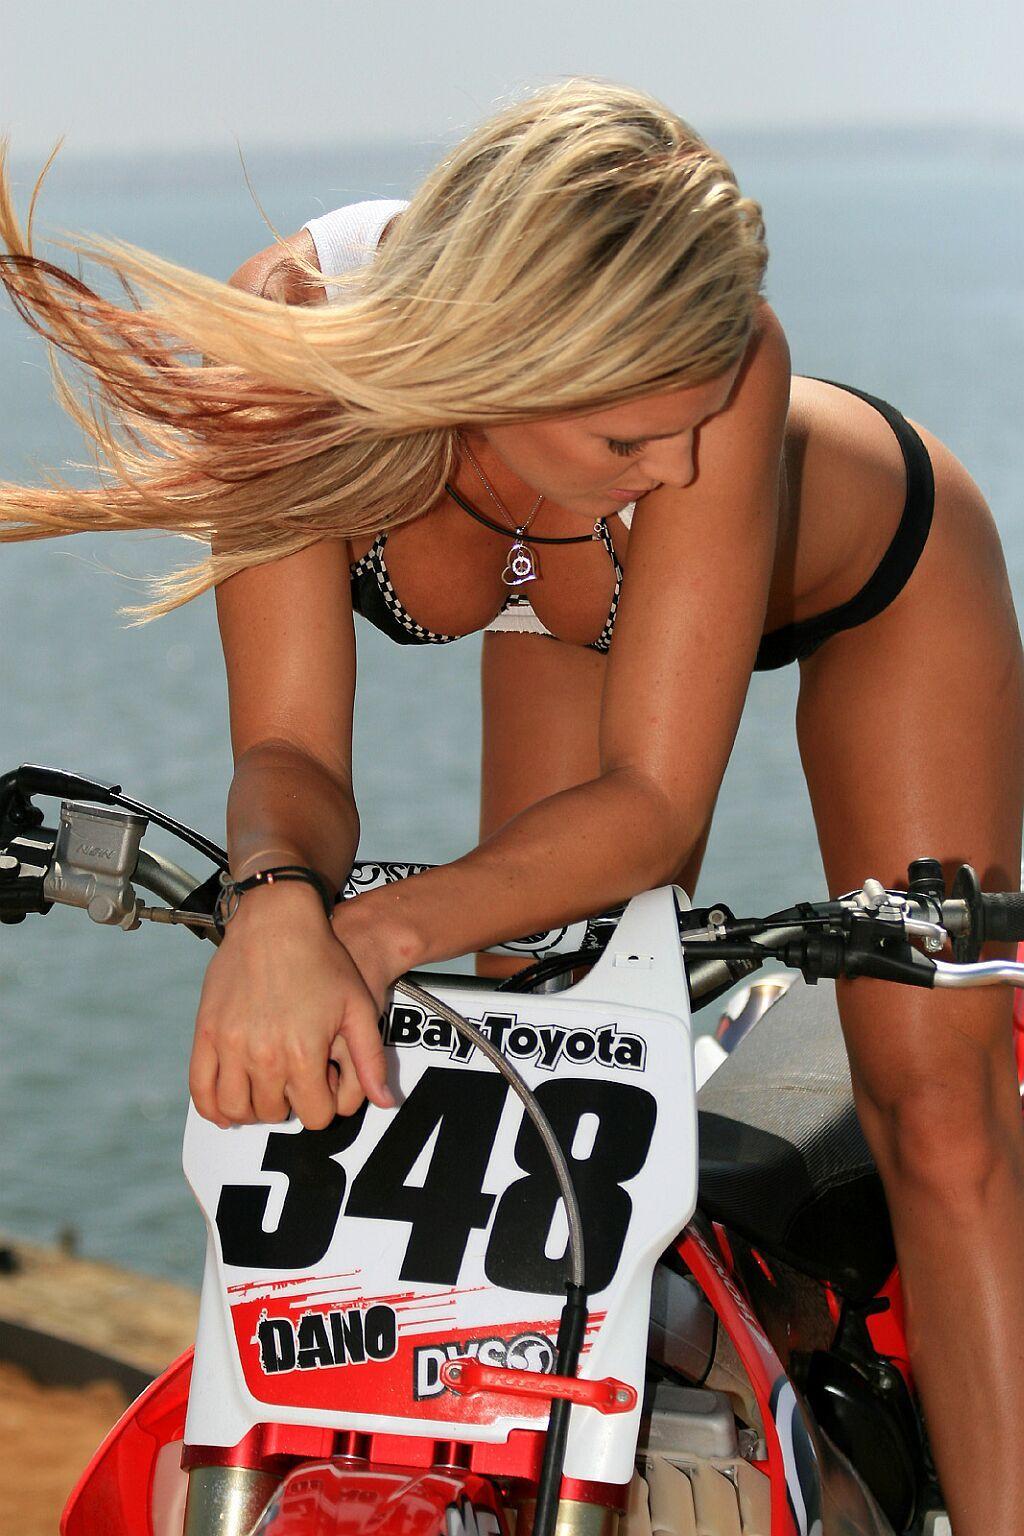 Motocross Girl  Hot Rides  Sexy Ladys  Motocross Girls -6117